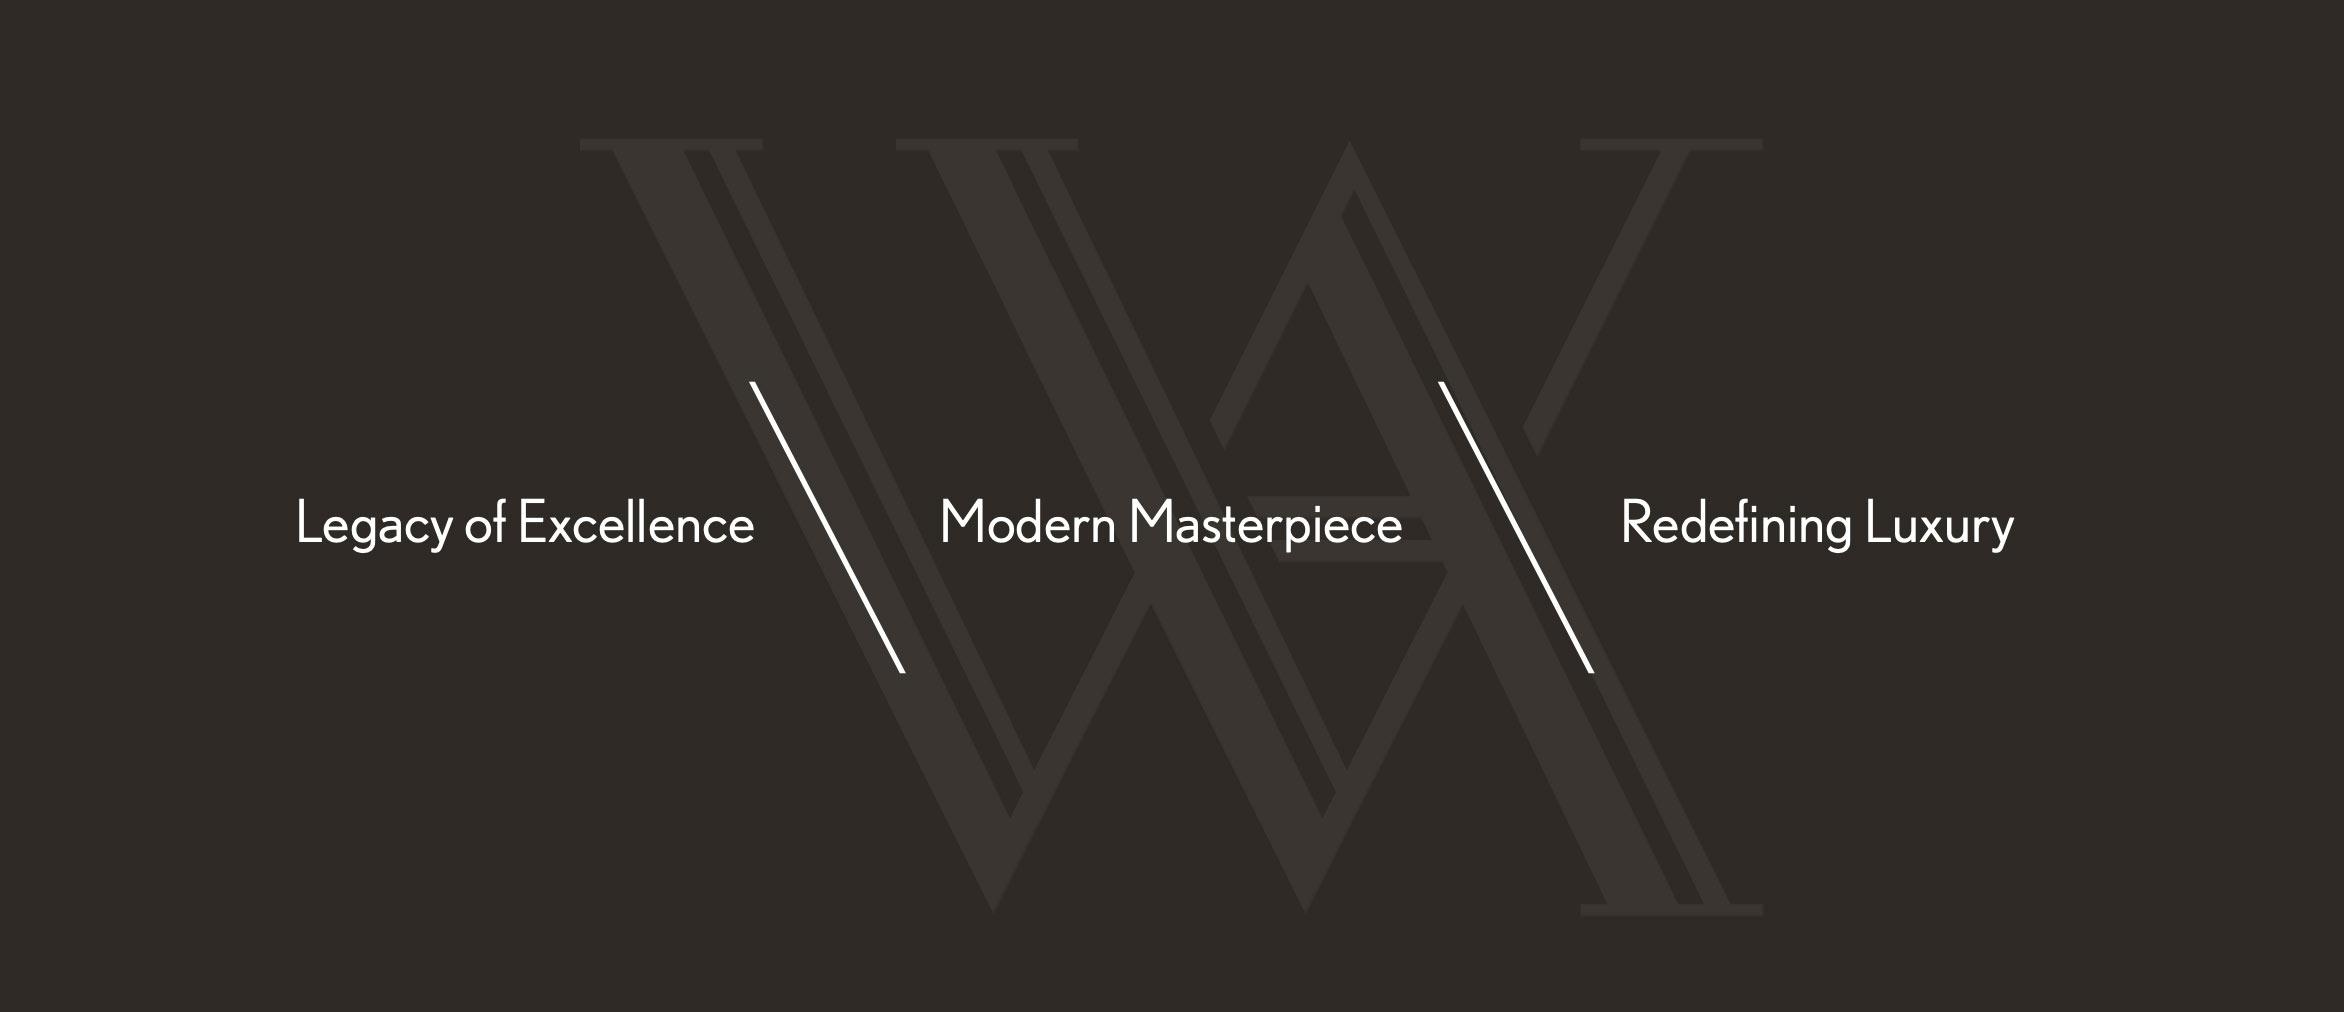 waldorf-astoria-miami-residences-condos-preconstrucion-florida-penthouse